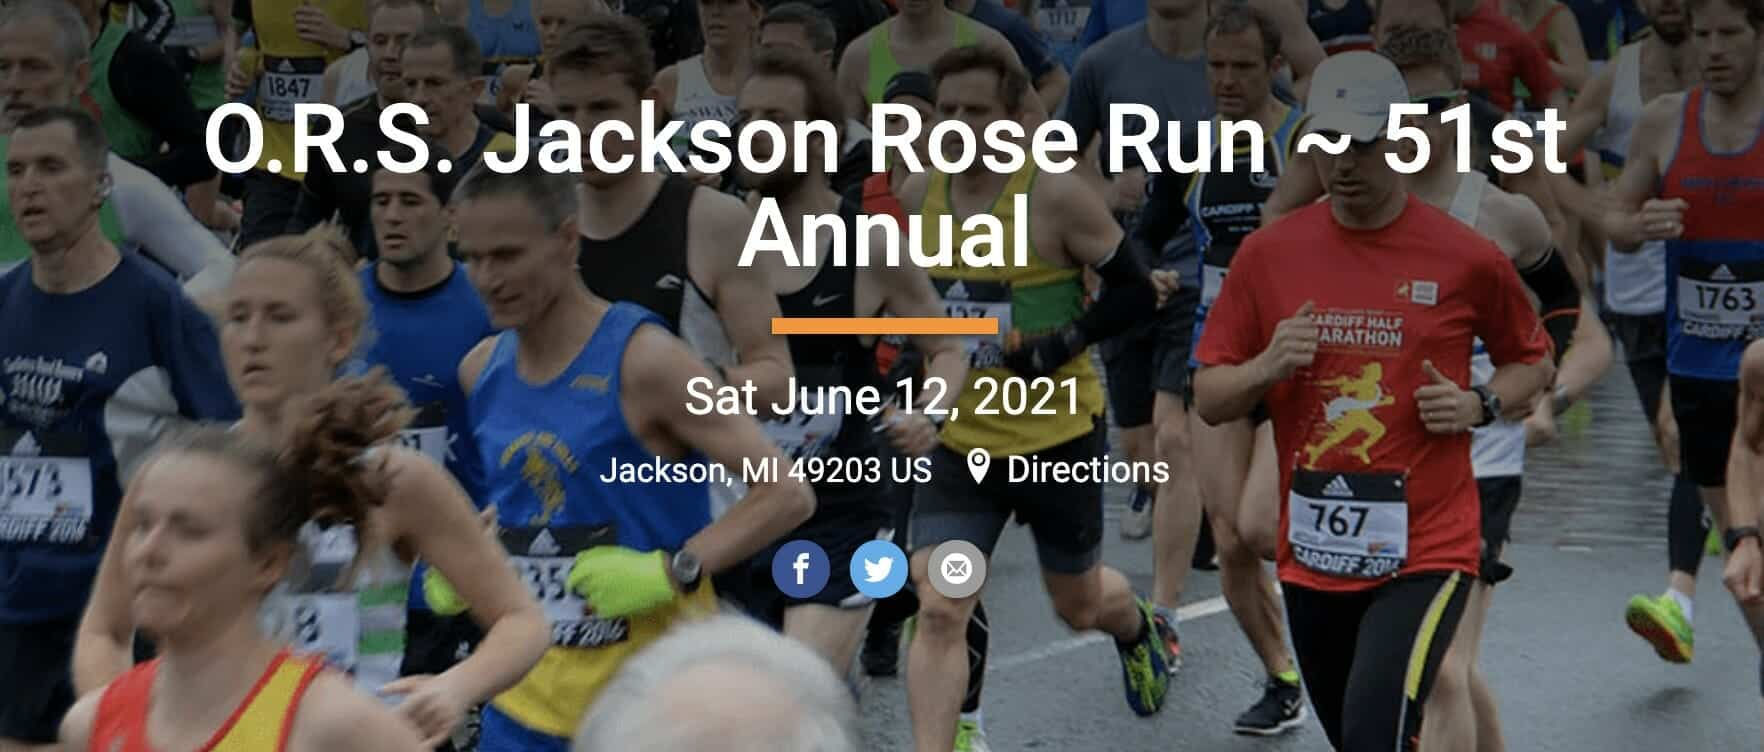 Jackson Rose Run